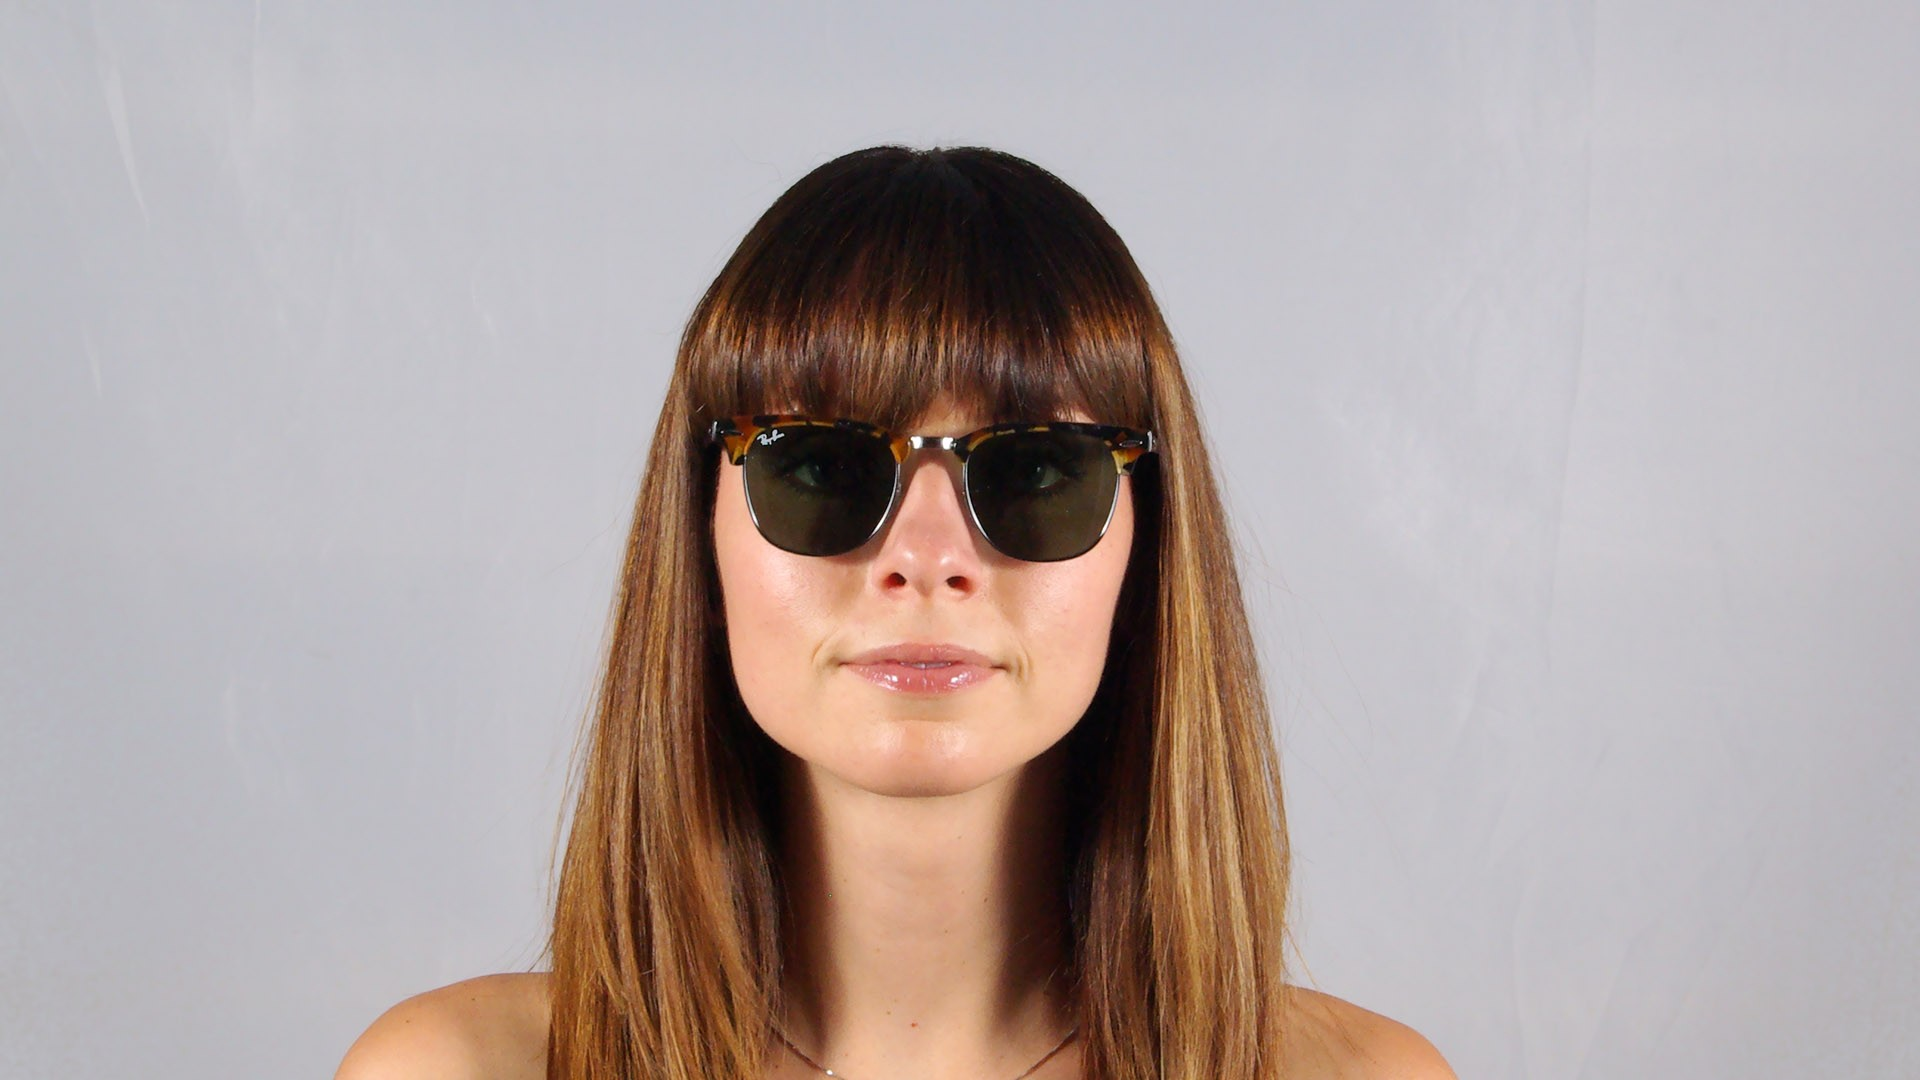 b10cb64a93e Sunglasses Ray-Ban Clubmaster Fleck Tortoise G15 RB3016 1157 49-21 Small